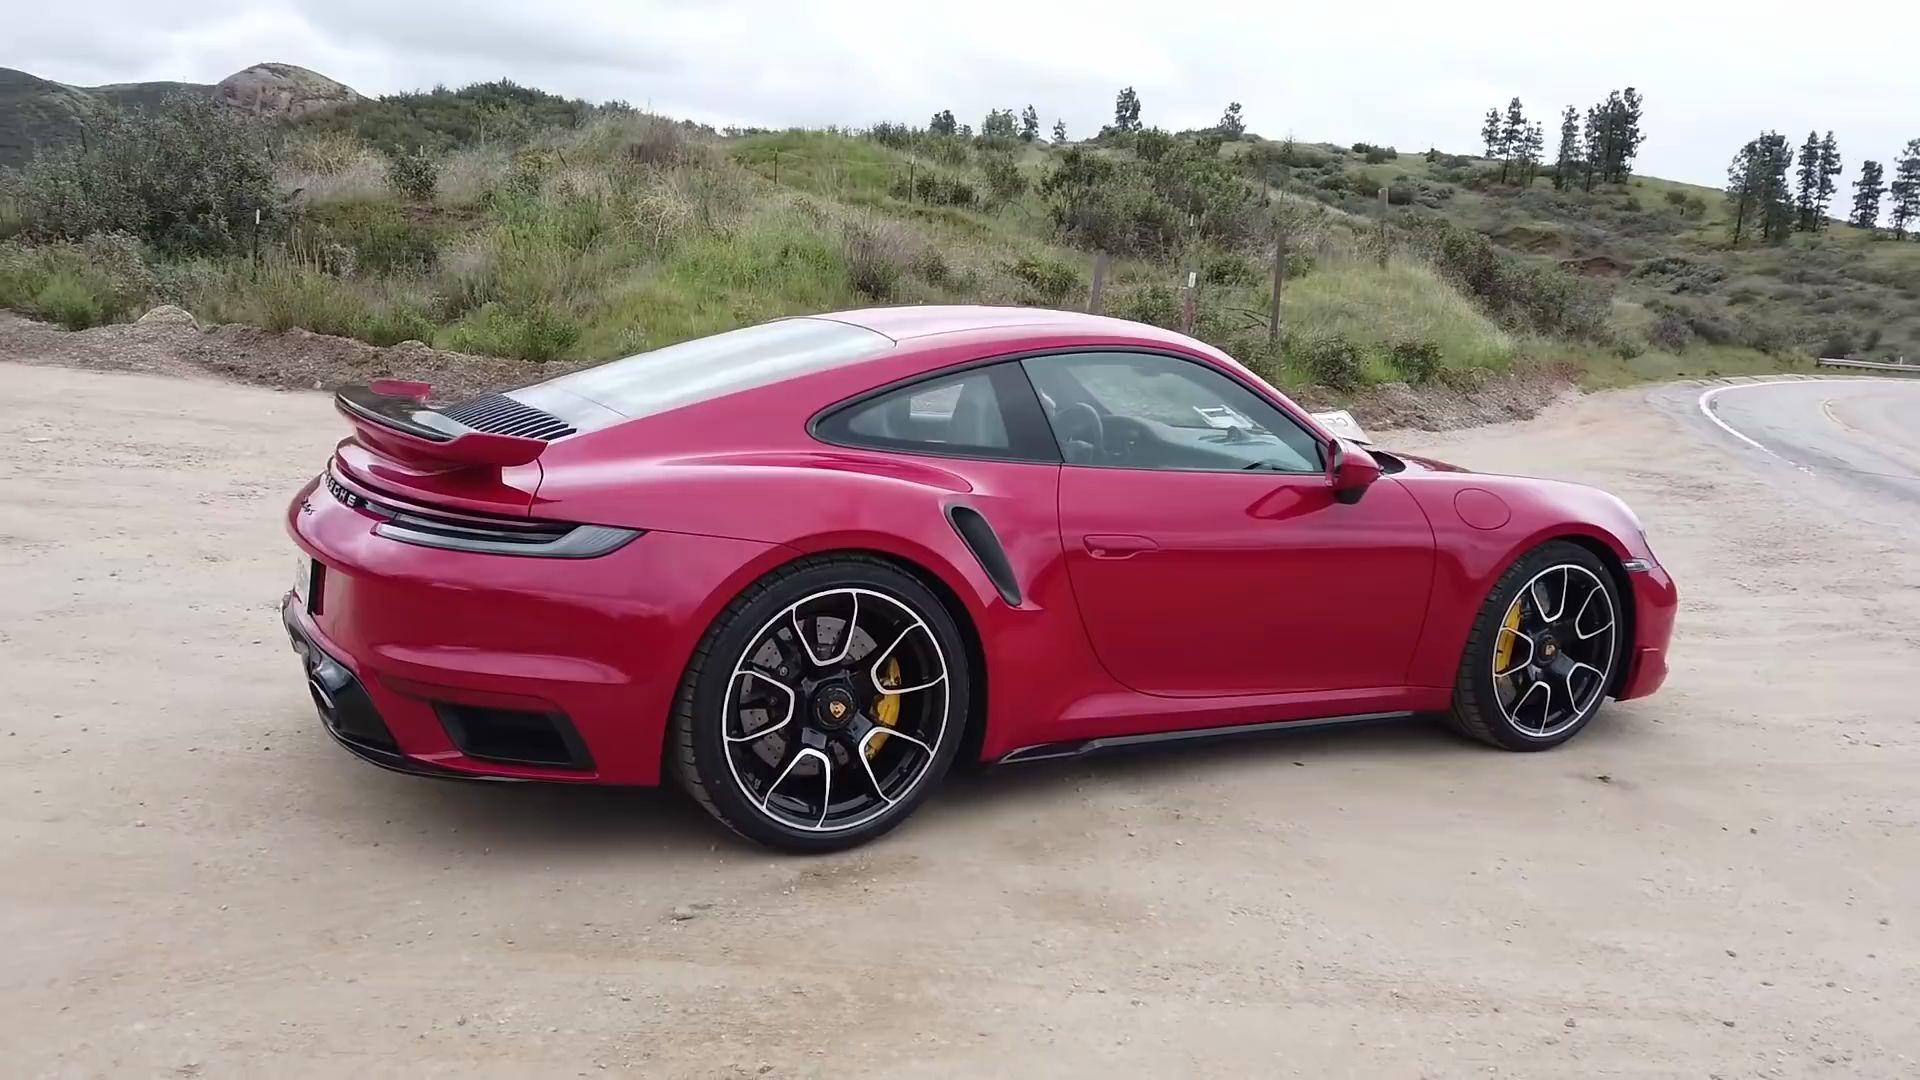 法拉利保时捷911_Porsches 2021 992 Turbo S is a 640 HP, $200,000 Daily Driver - One Take_哔哩哔哩 ...